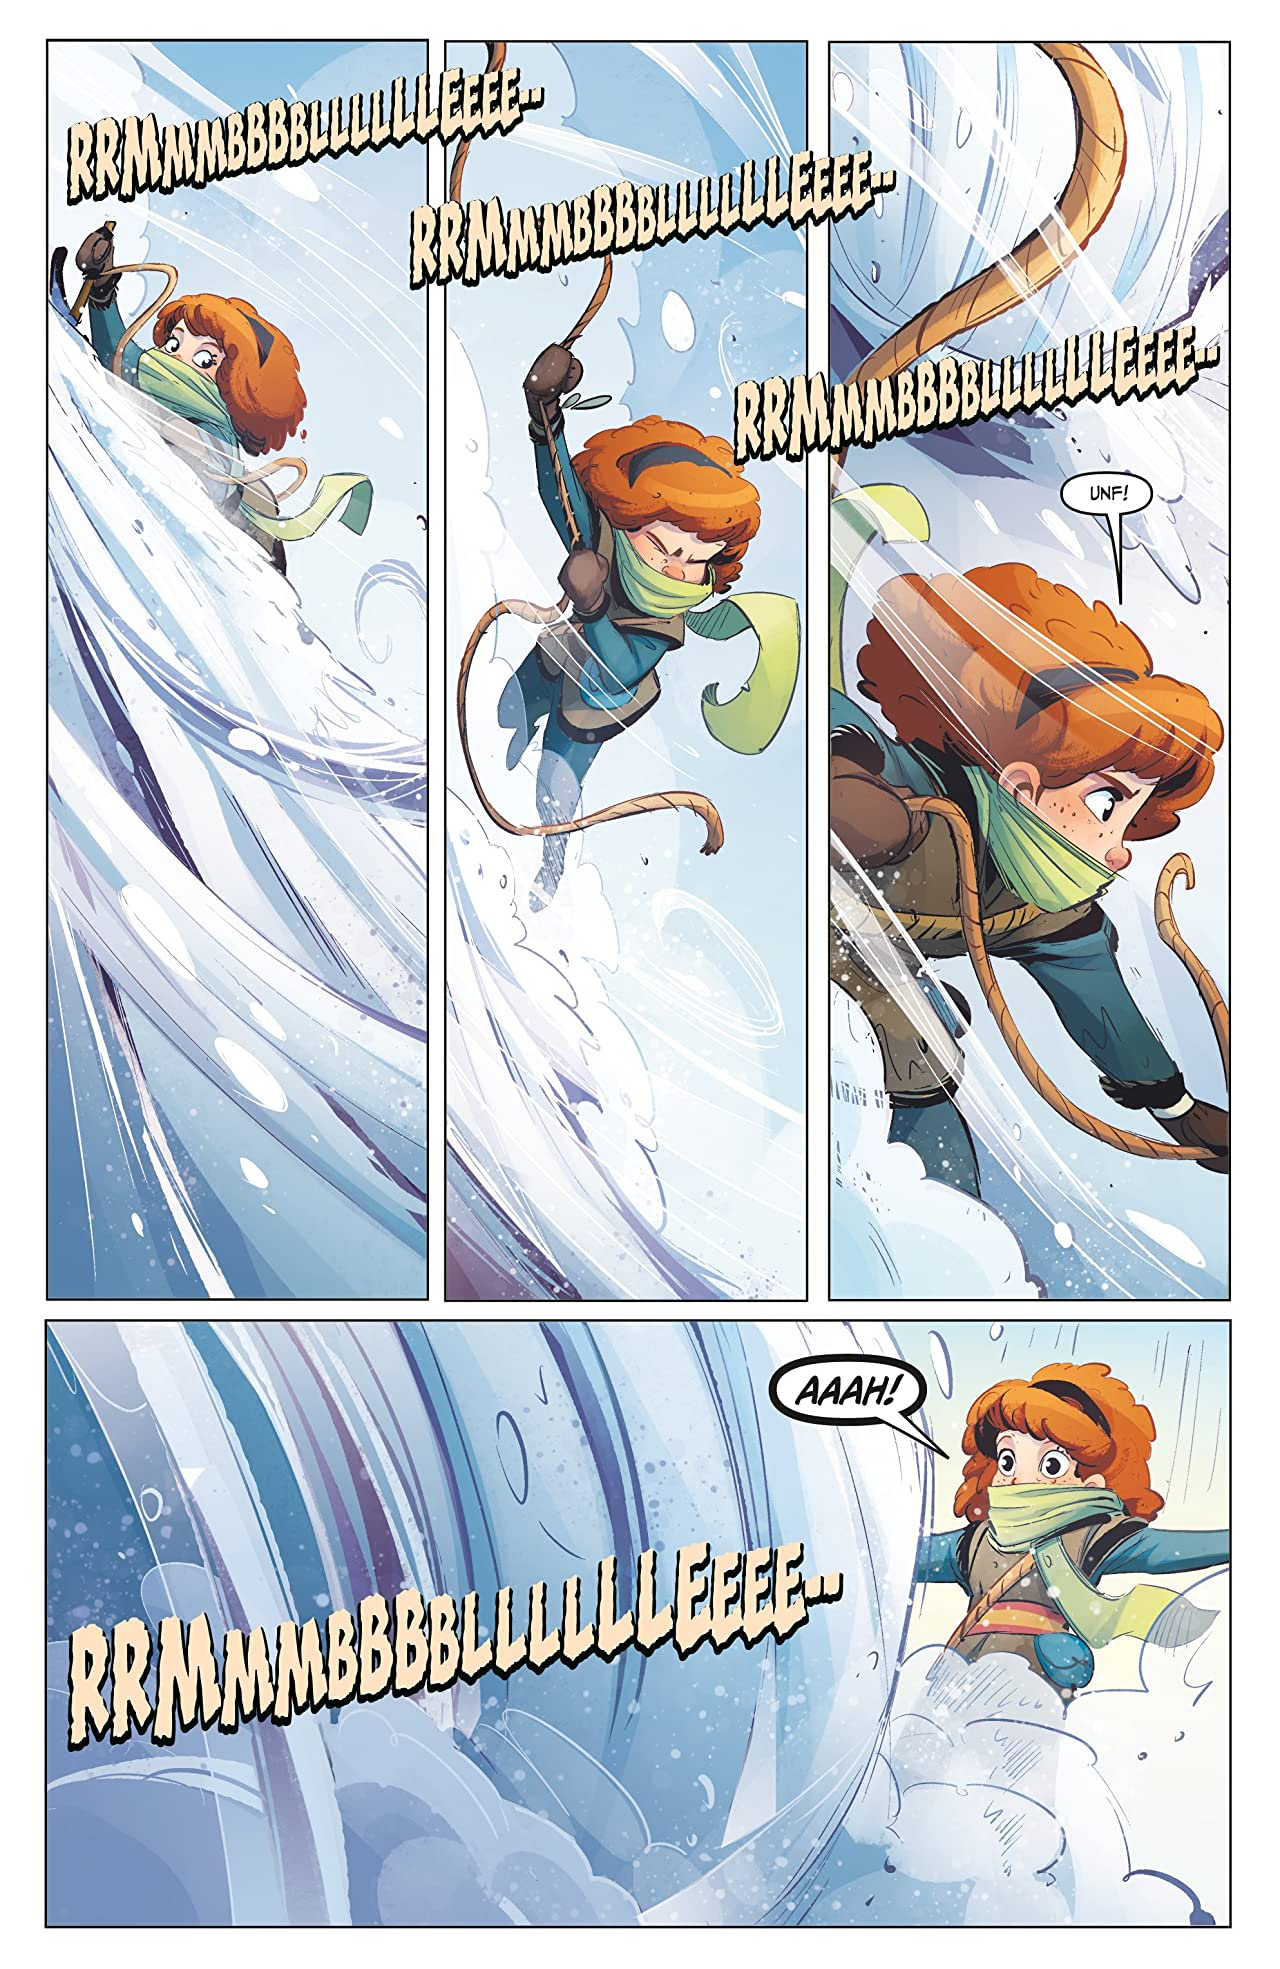 Disney Frozen: The Hero Within #1